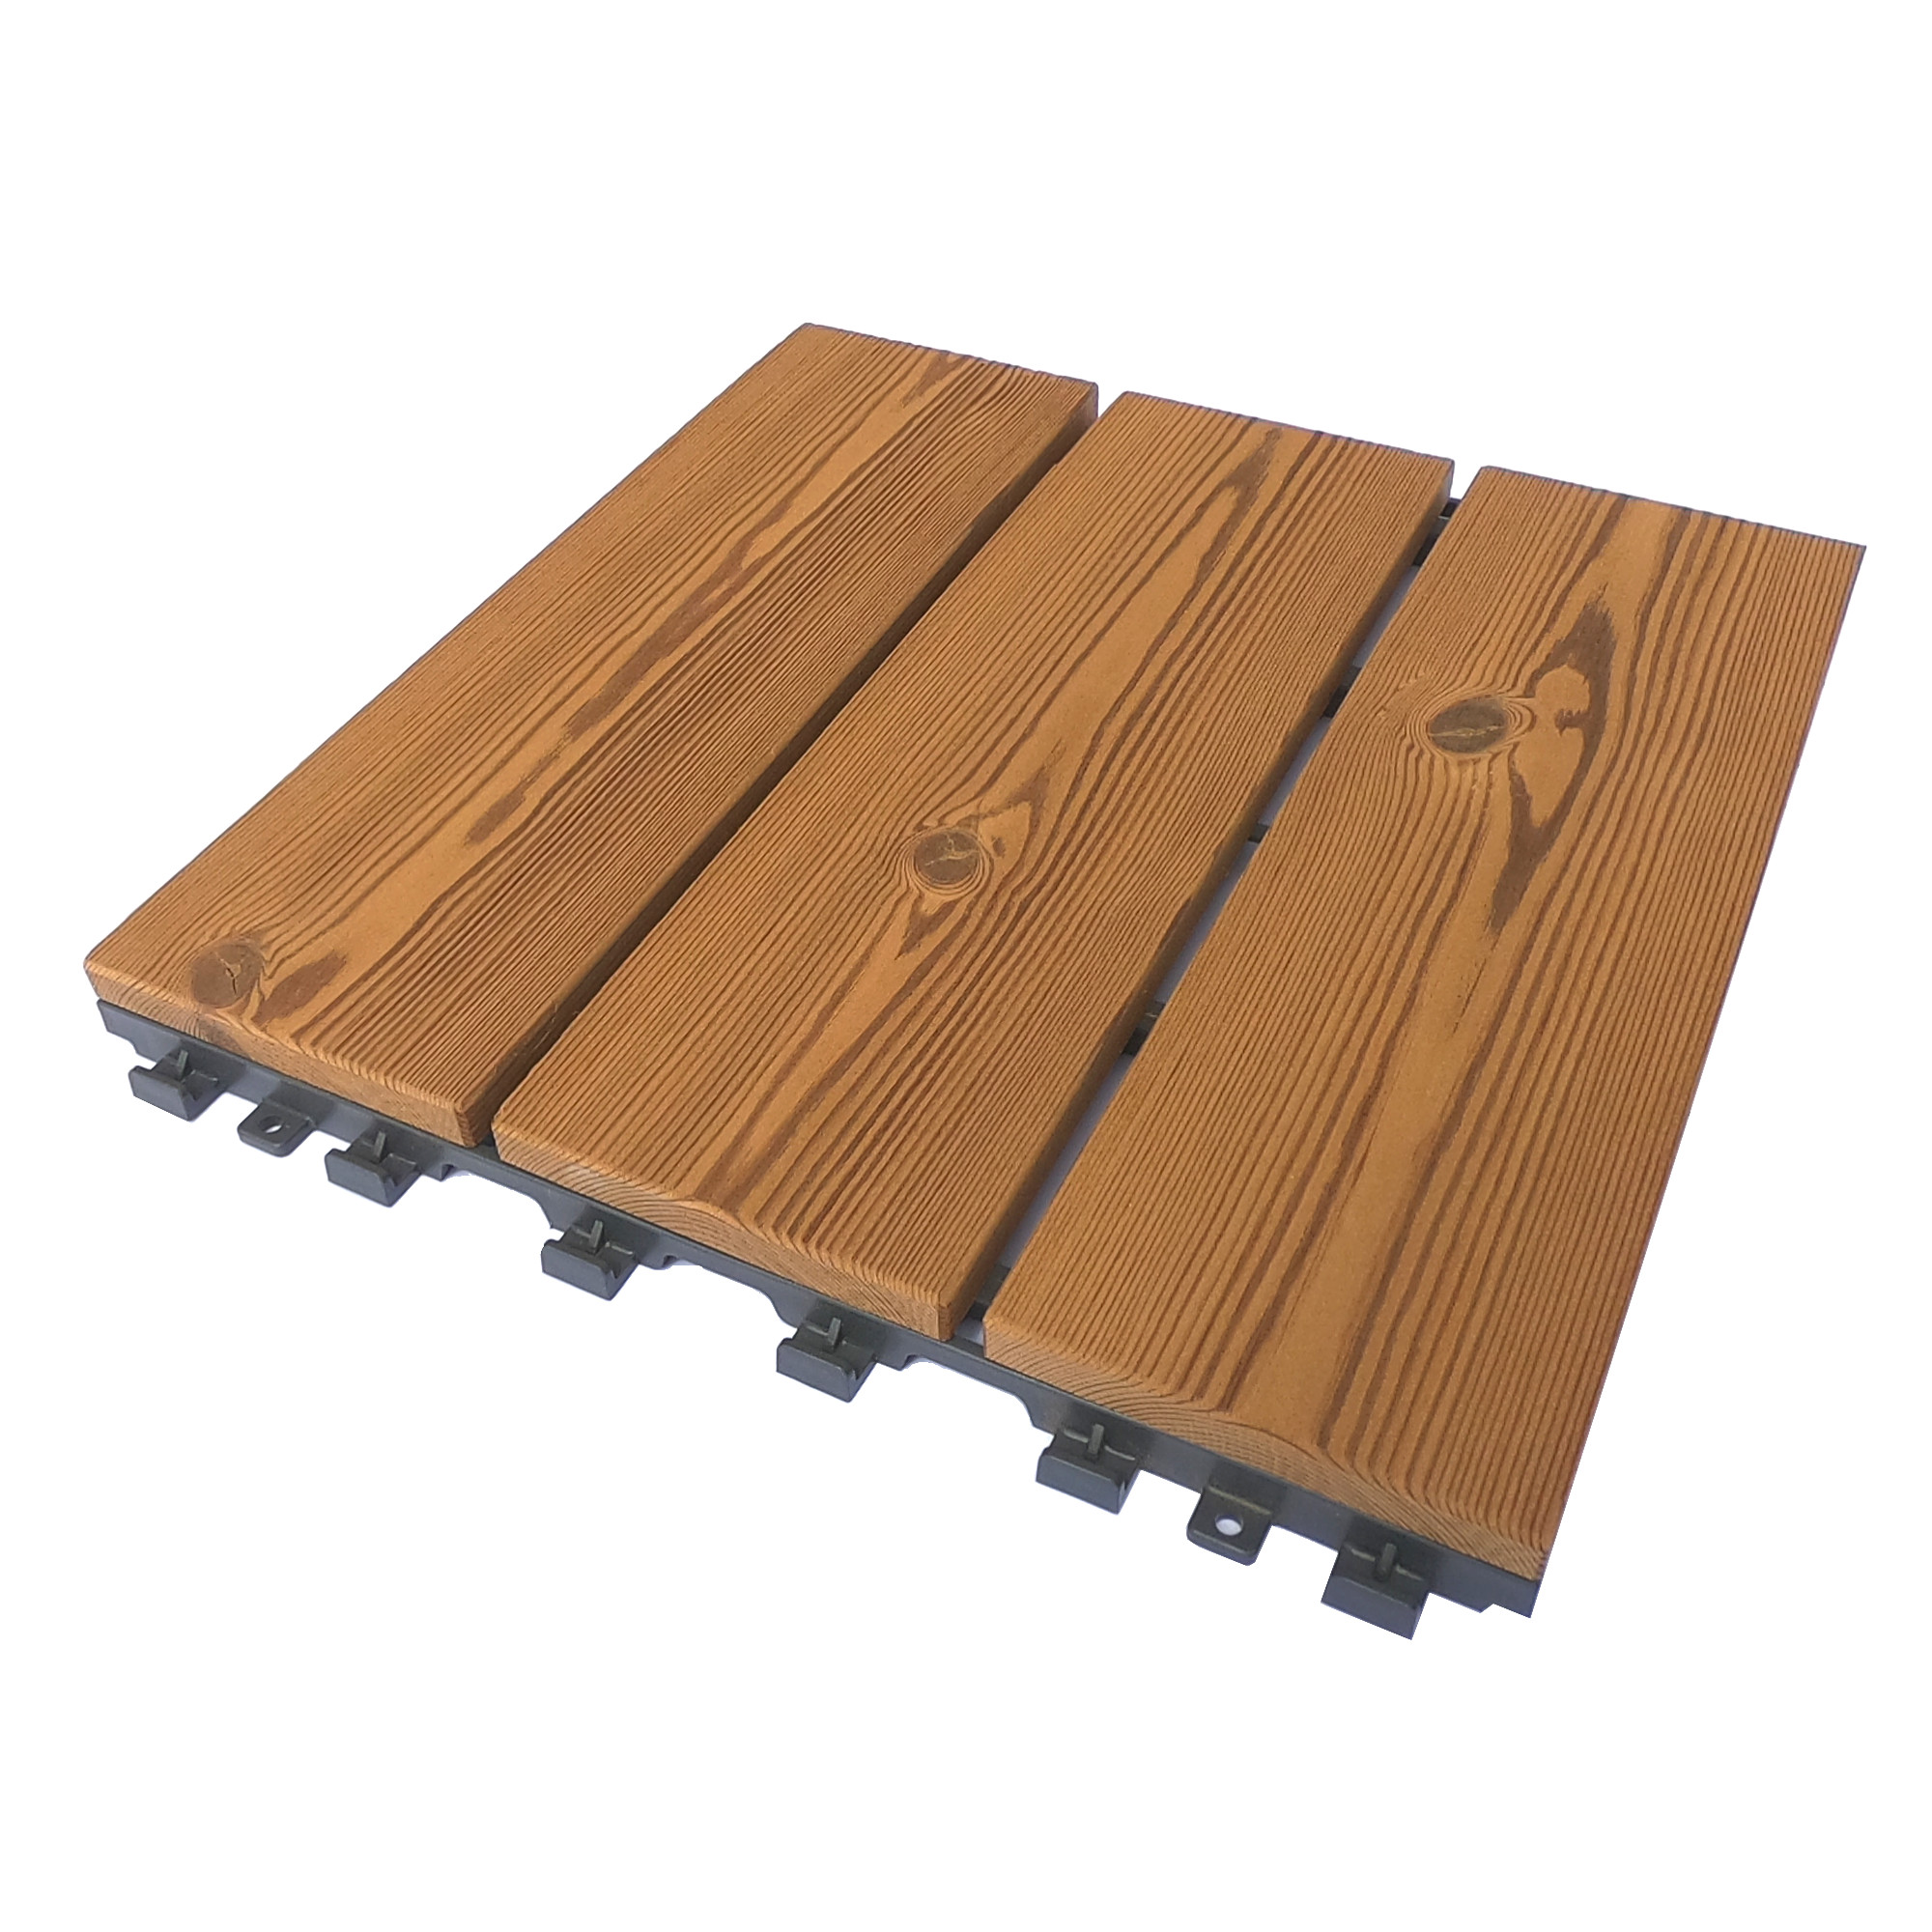 Smartdeck modular tile in thermowood pine